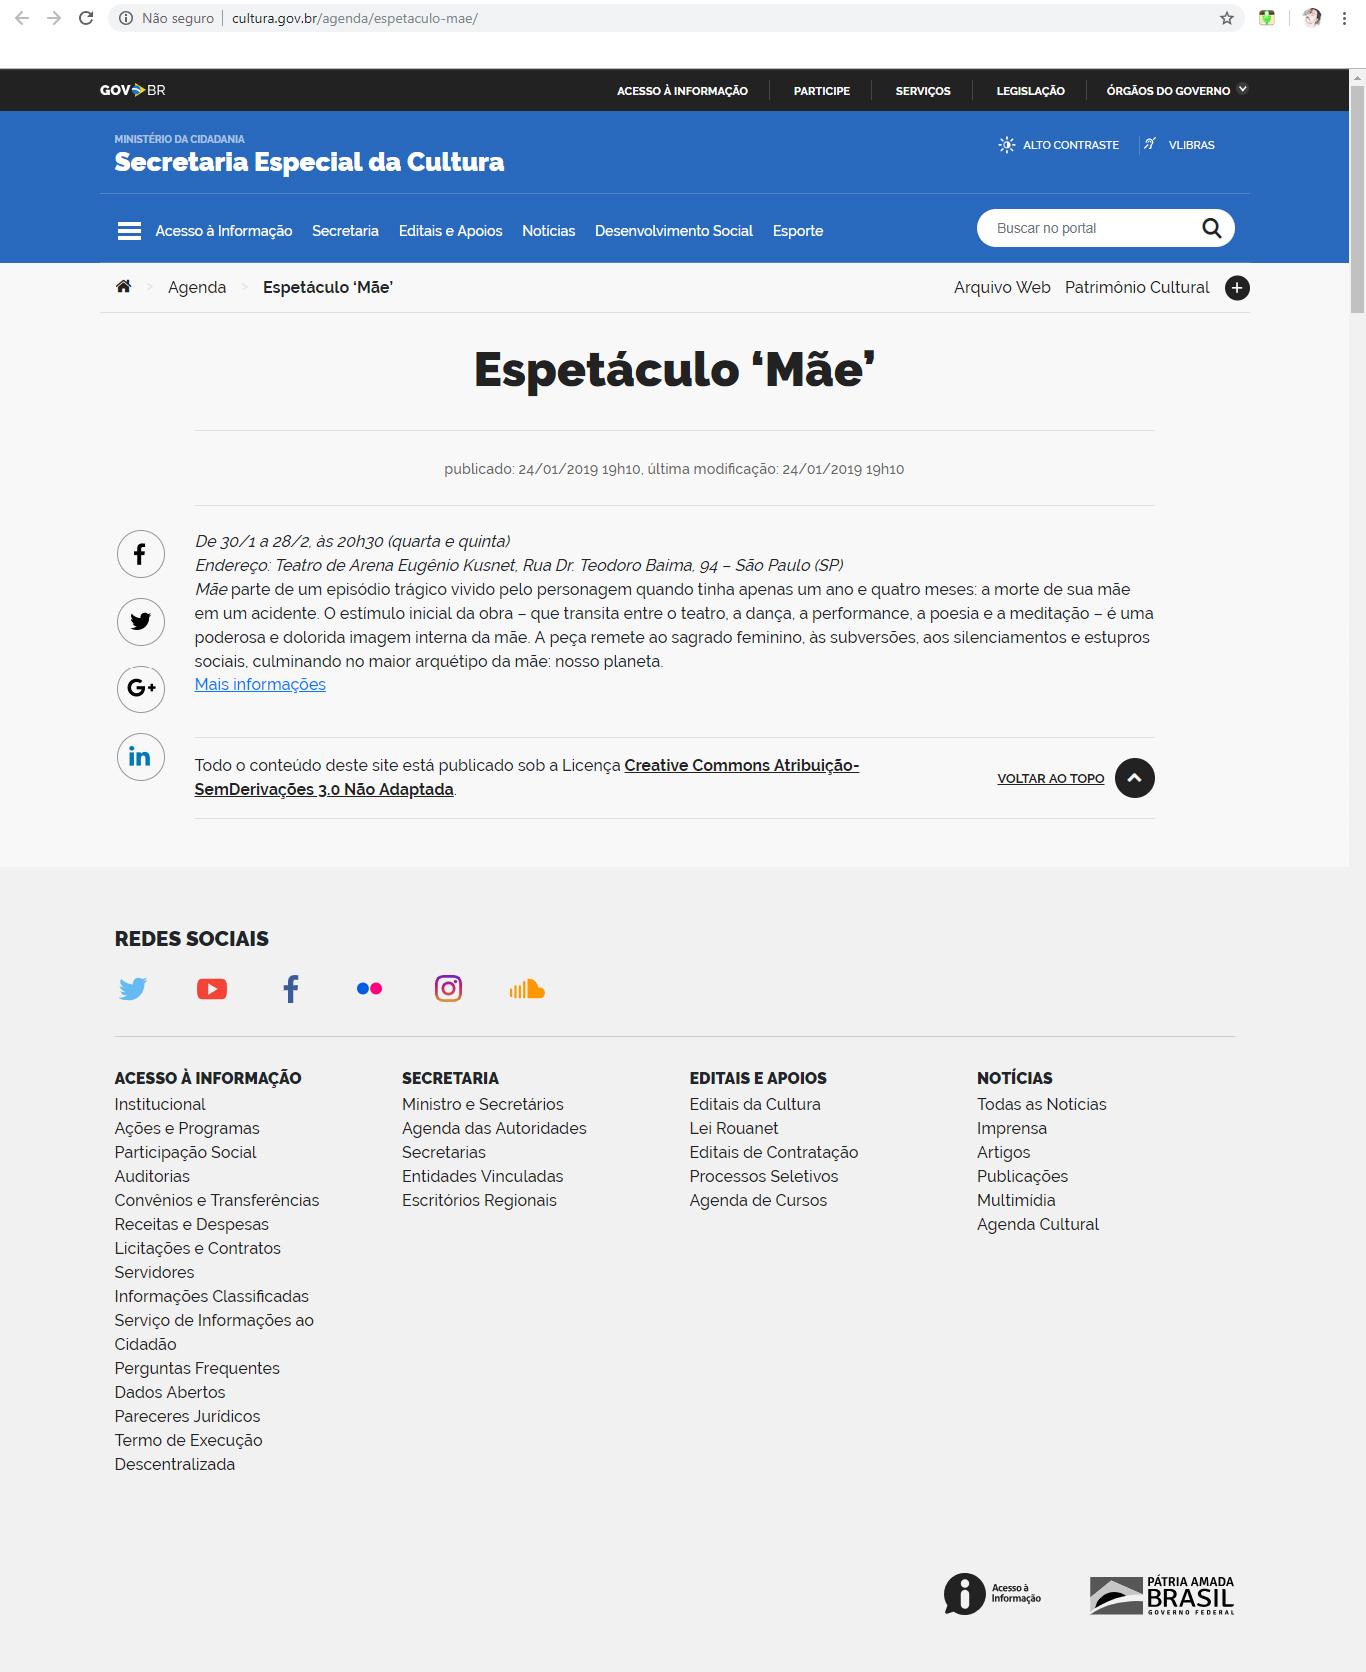 Secretaria_Especial_da_Cultura_Espetácul